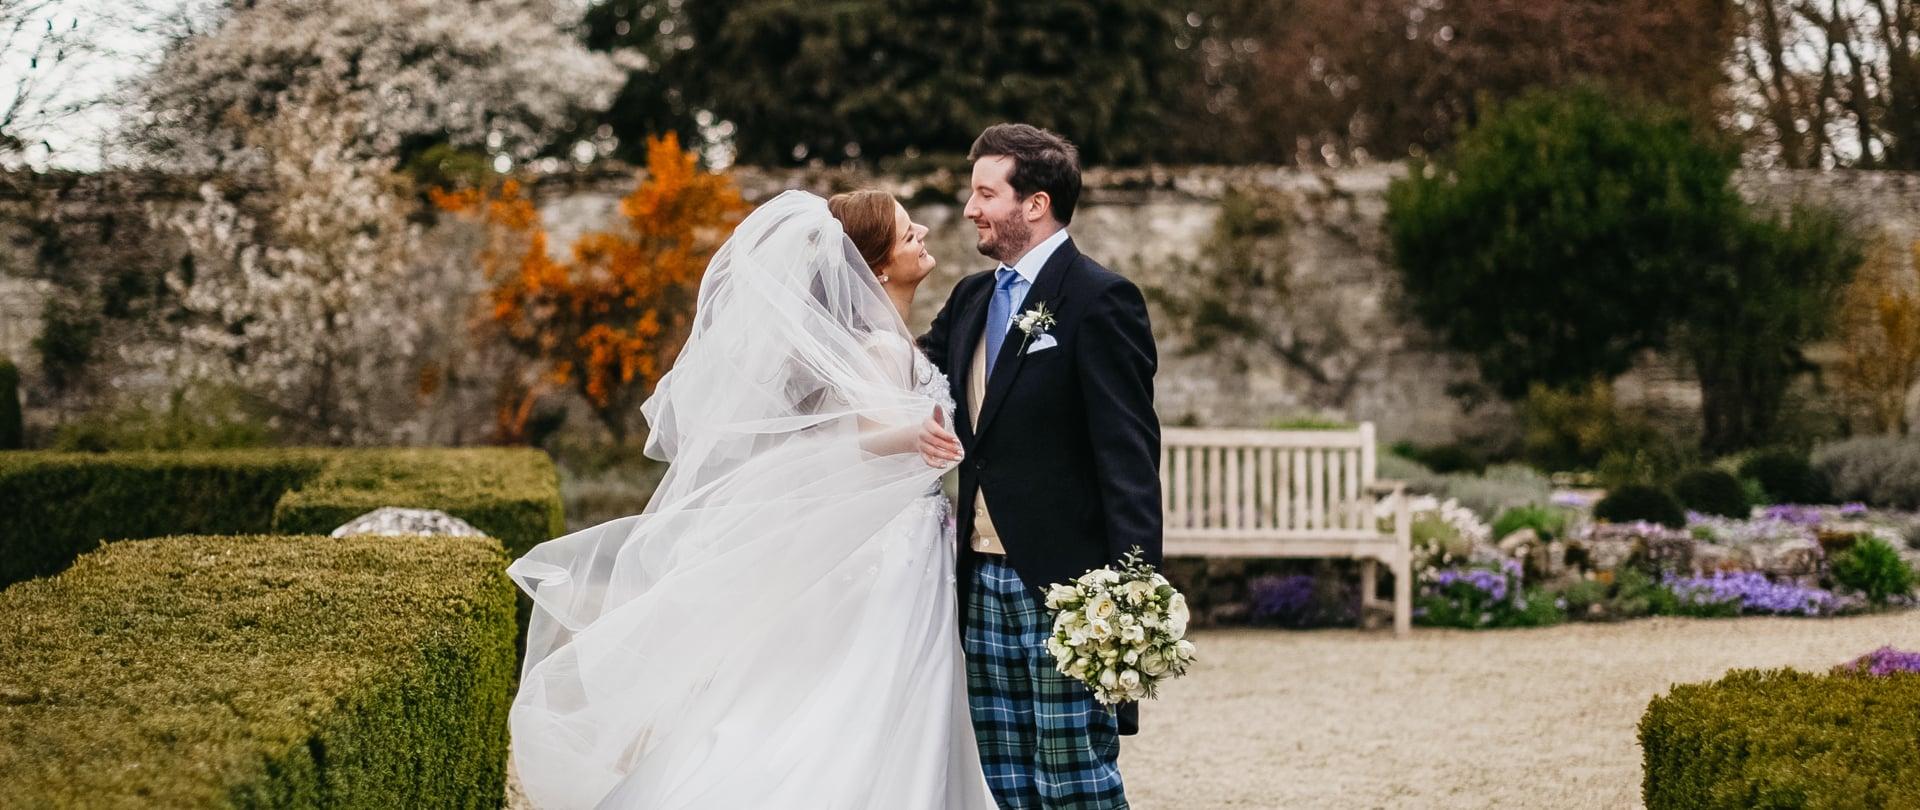 Emily & Rob Wedding Video Filmed at Oxfordshire, England